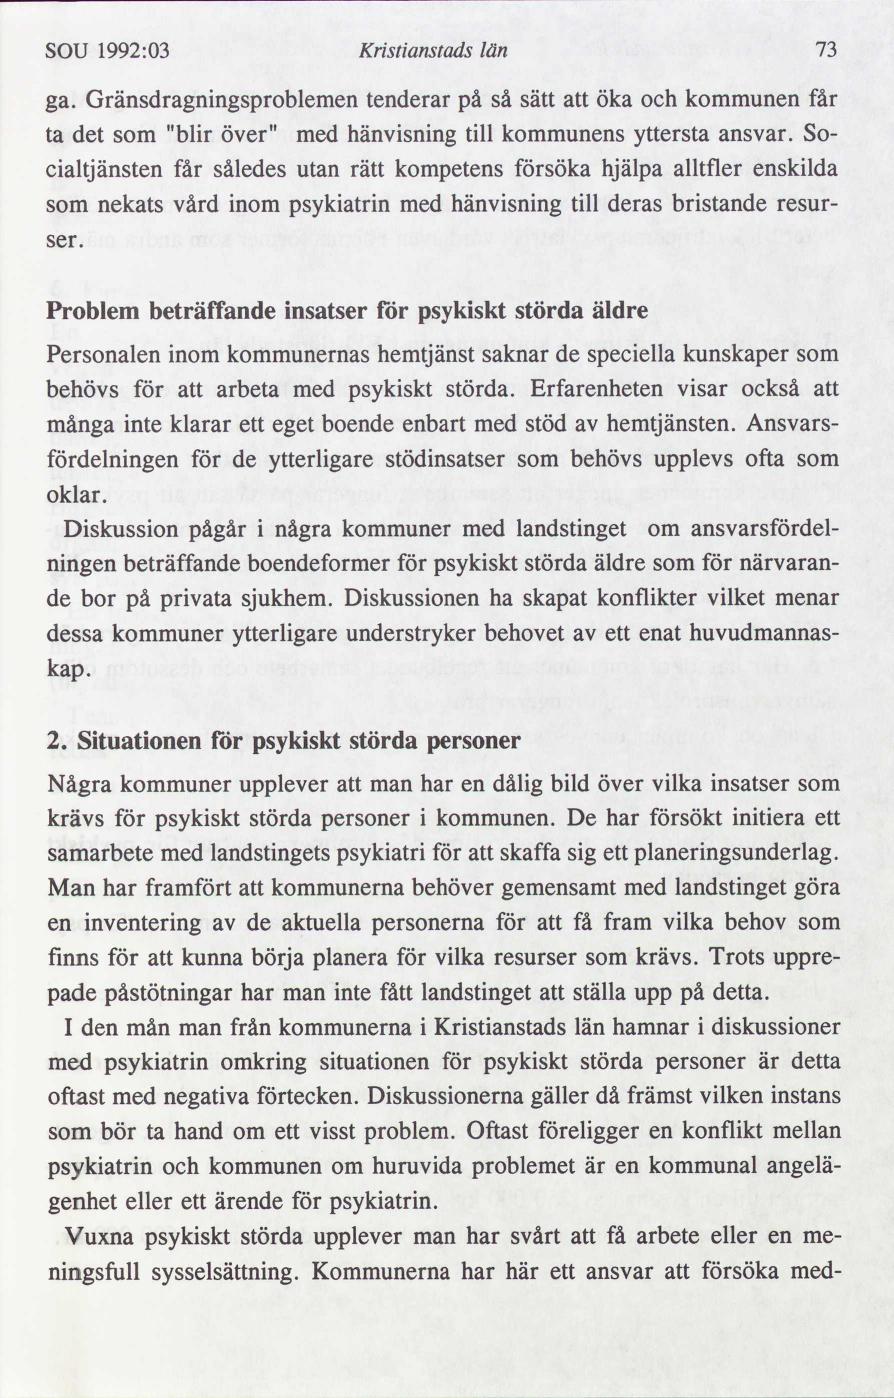 Karlshamn far jo kritik for bristande vard